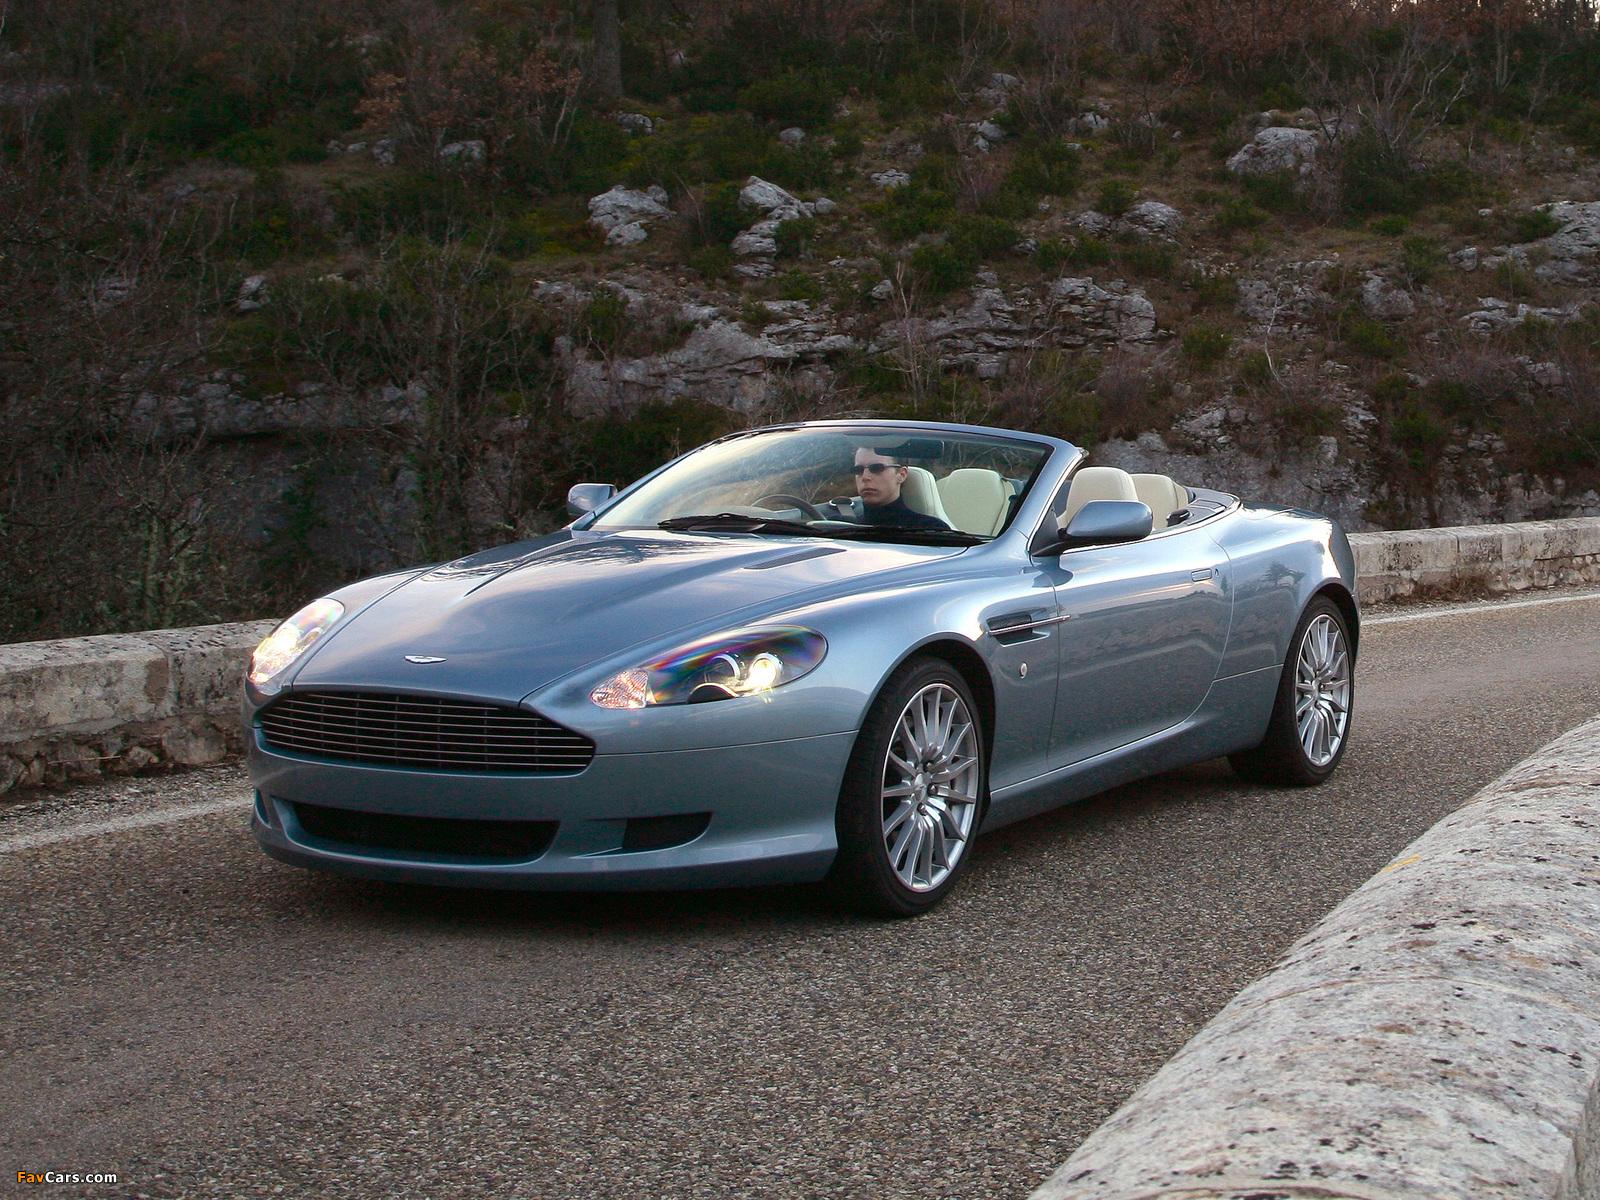 Aston Martin Db9 Volante 2004 2008 Wallpapers 1600x1200